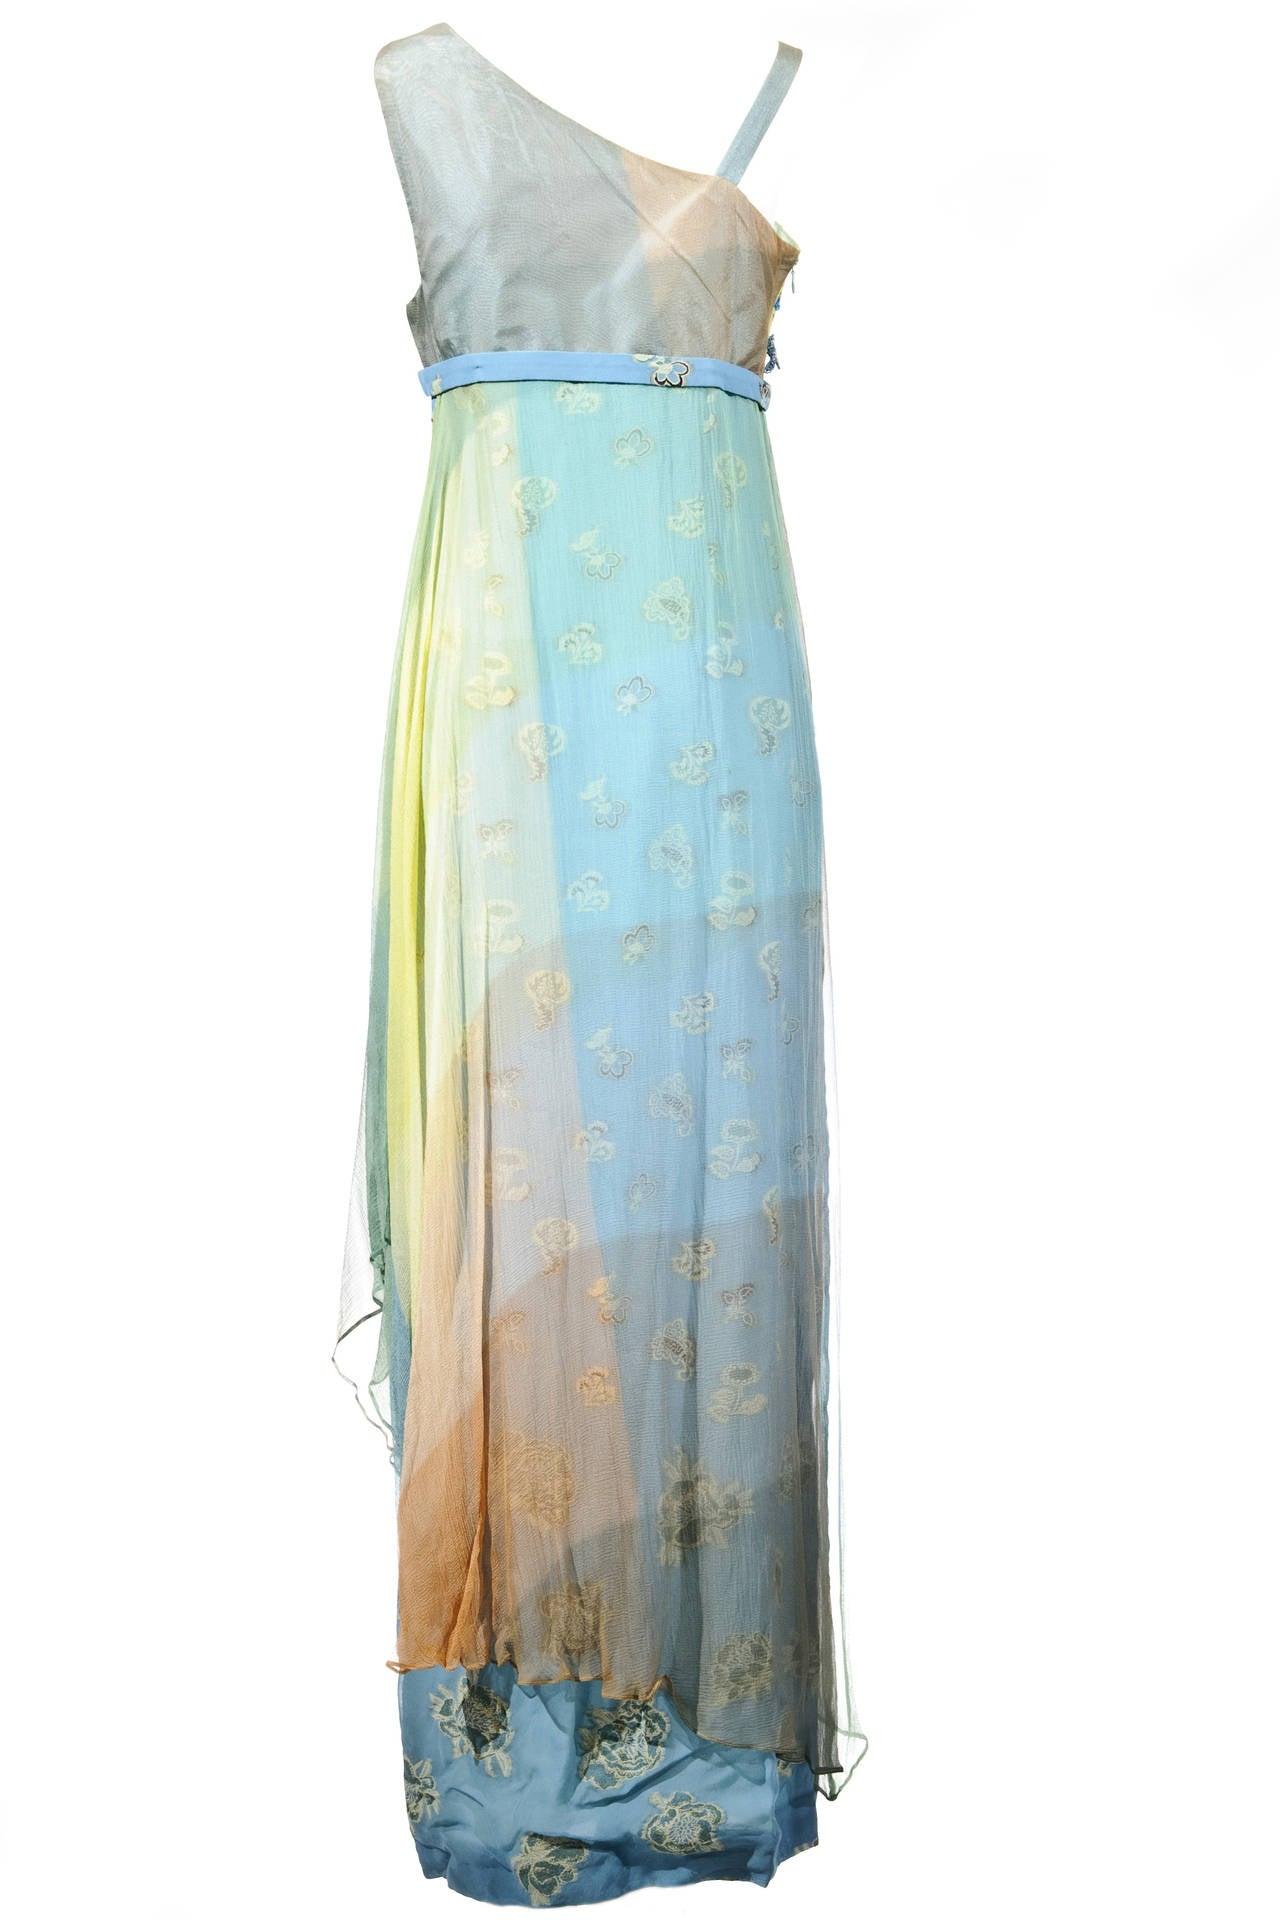 Christian Lacroix 90'S Multi-color Floral Jacquard Printed Evening Dress 3